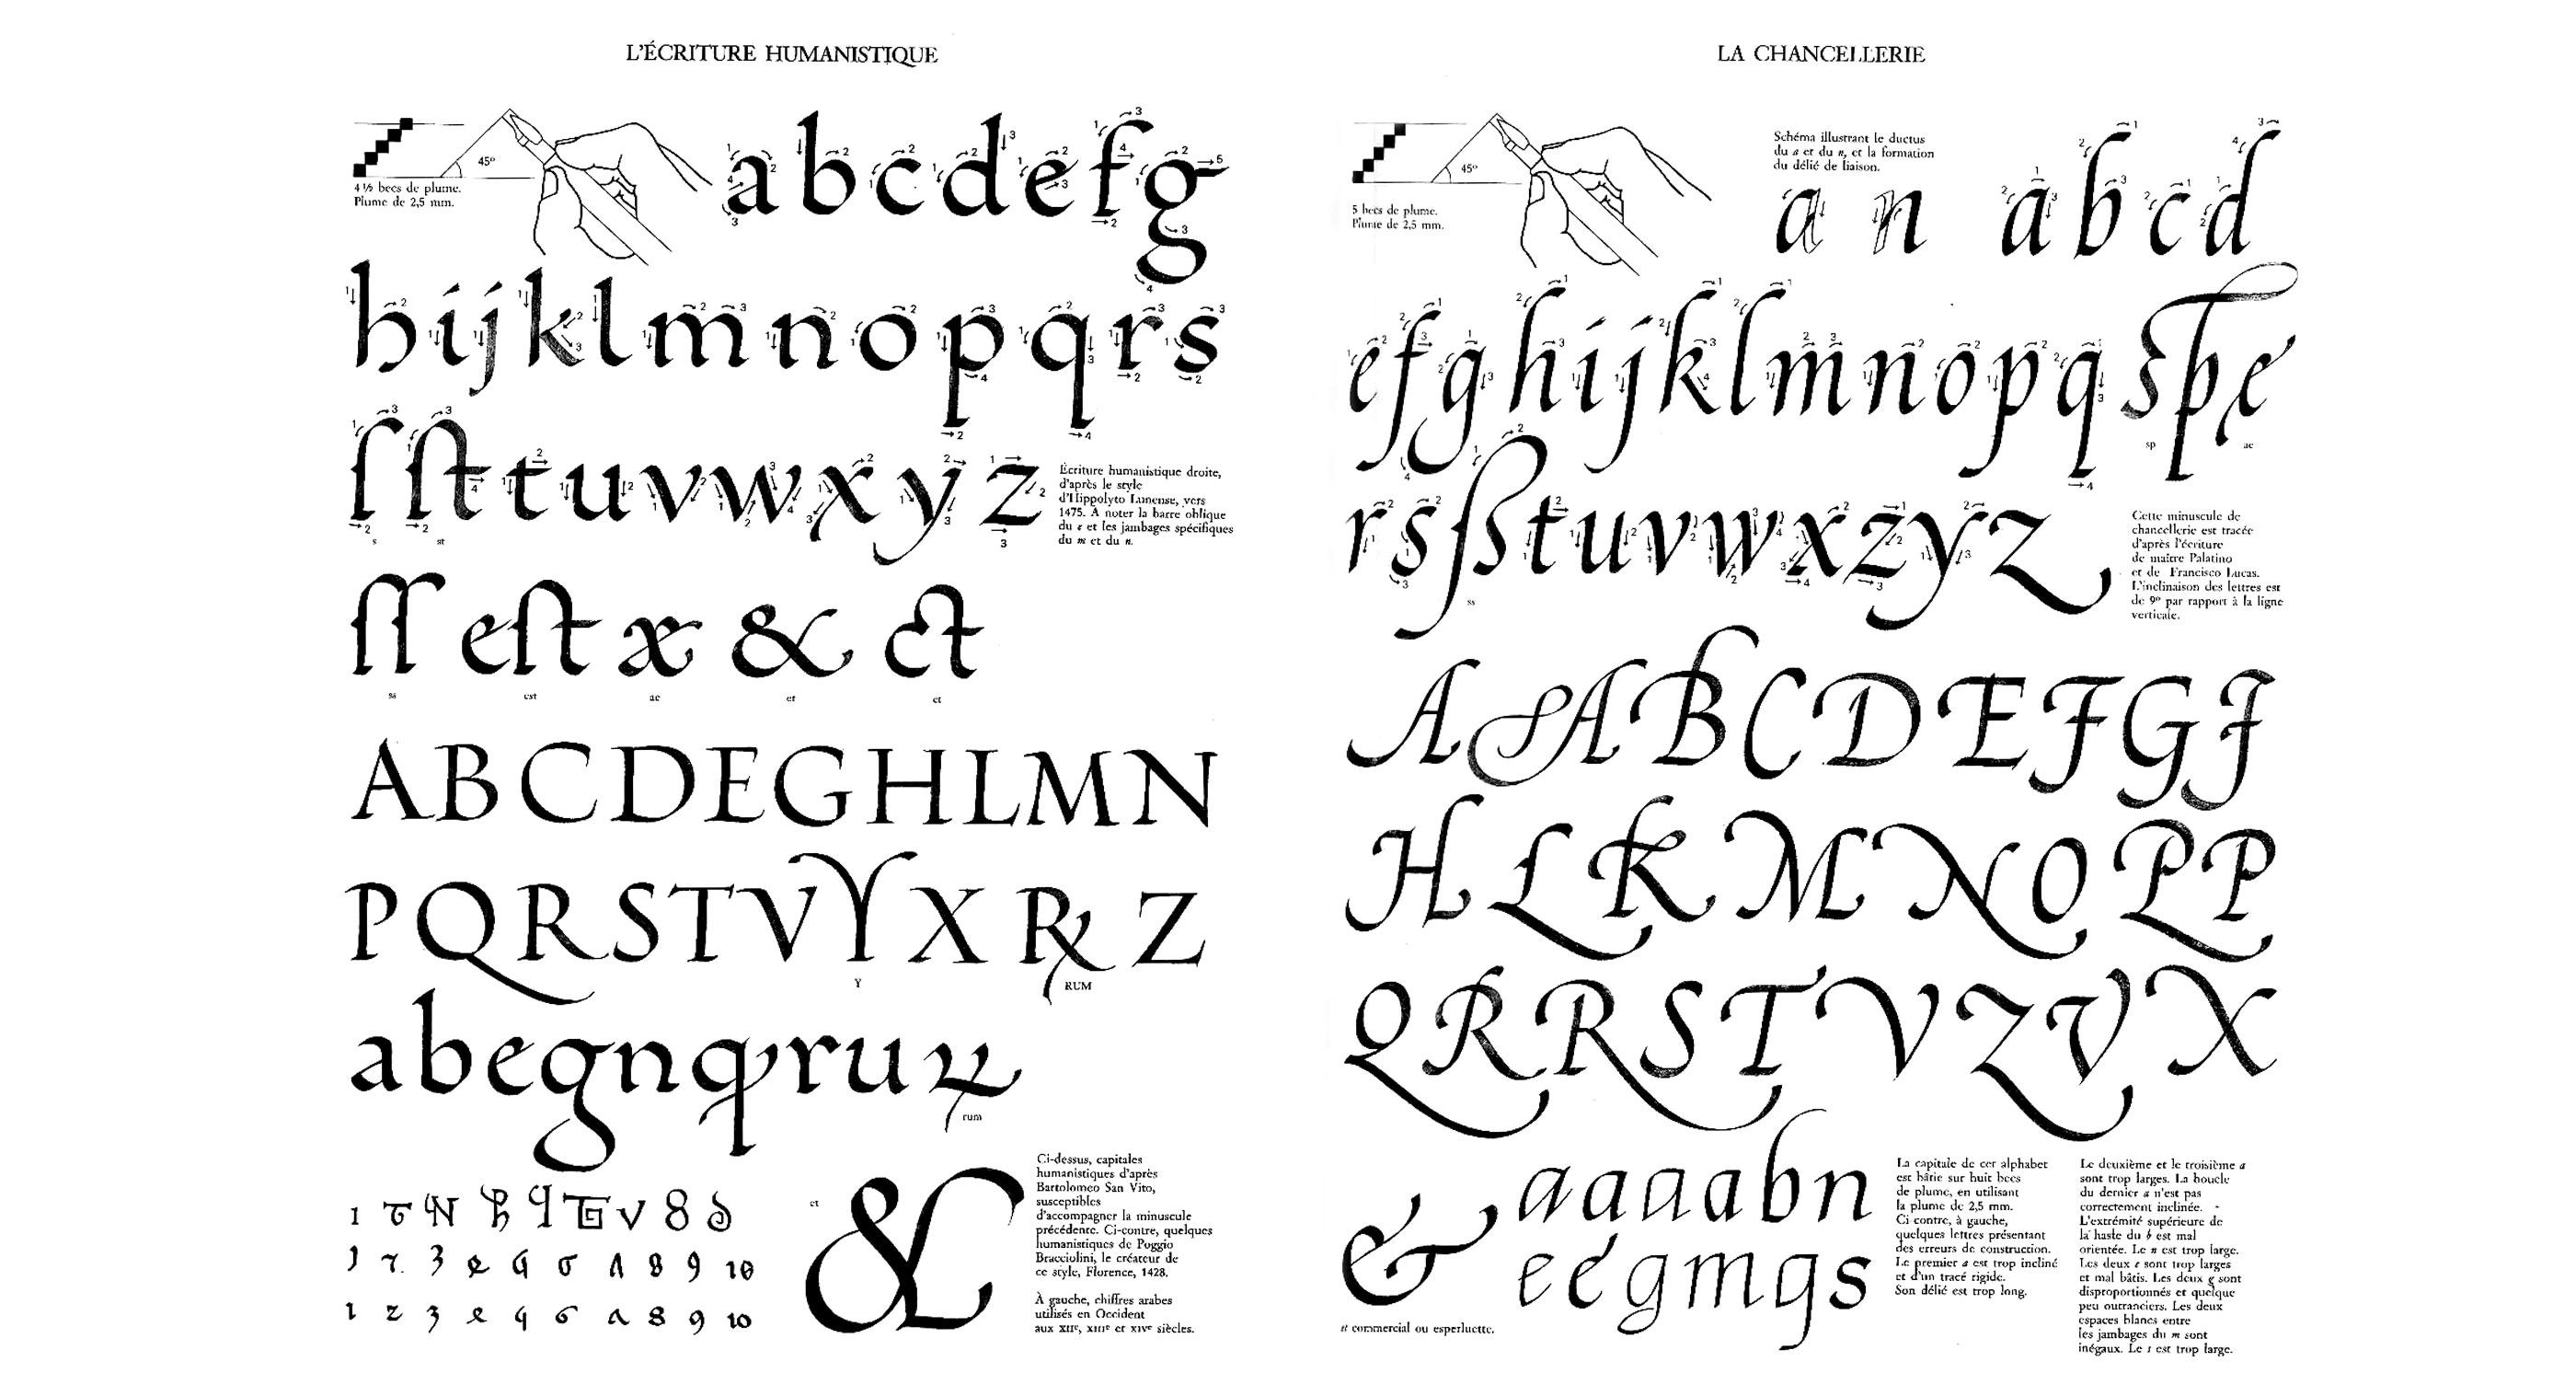 claude-mediavilla-calligraphie-ecriture-humanistique-la-chancellerie-nb